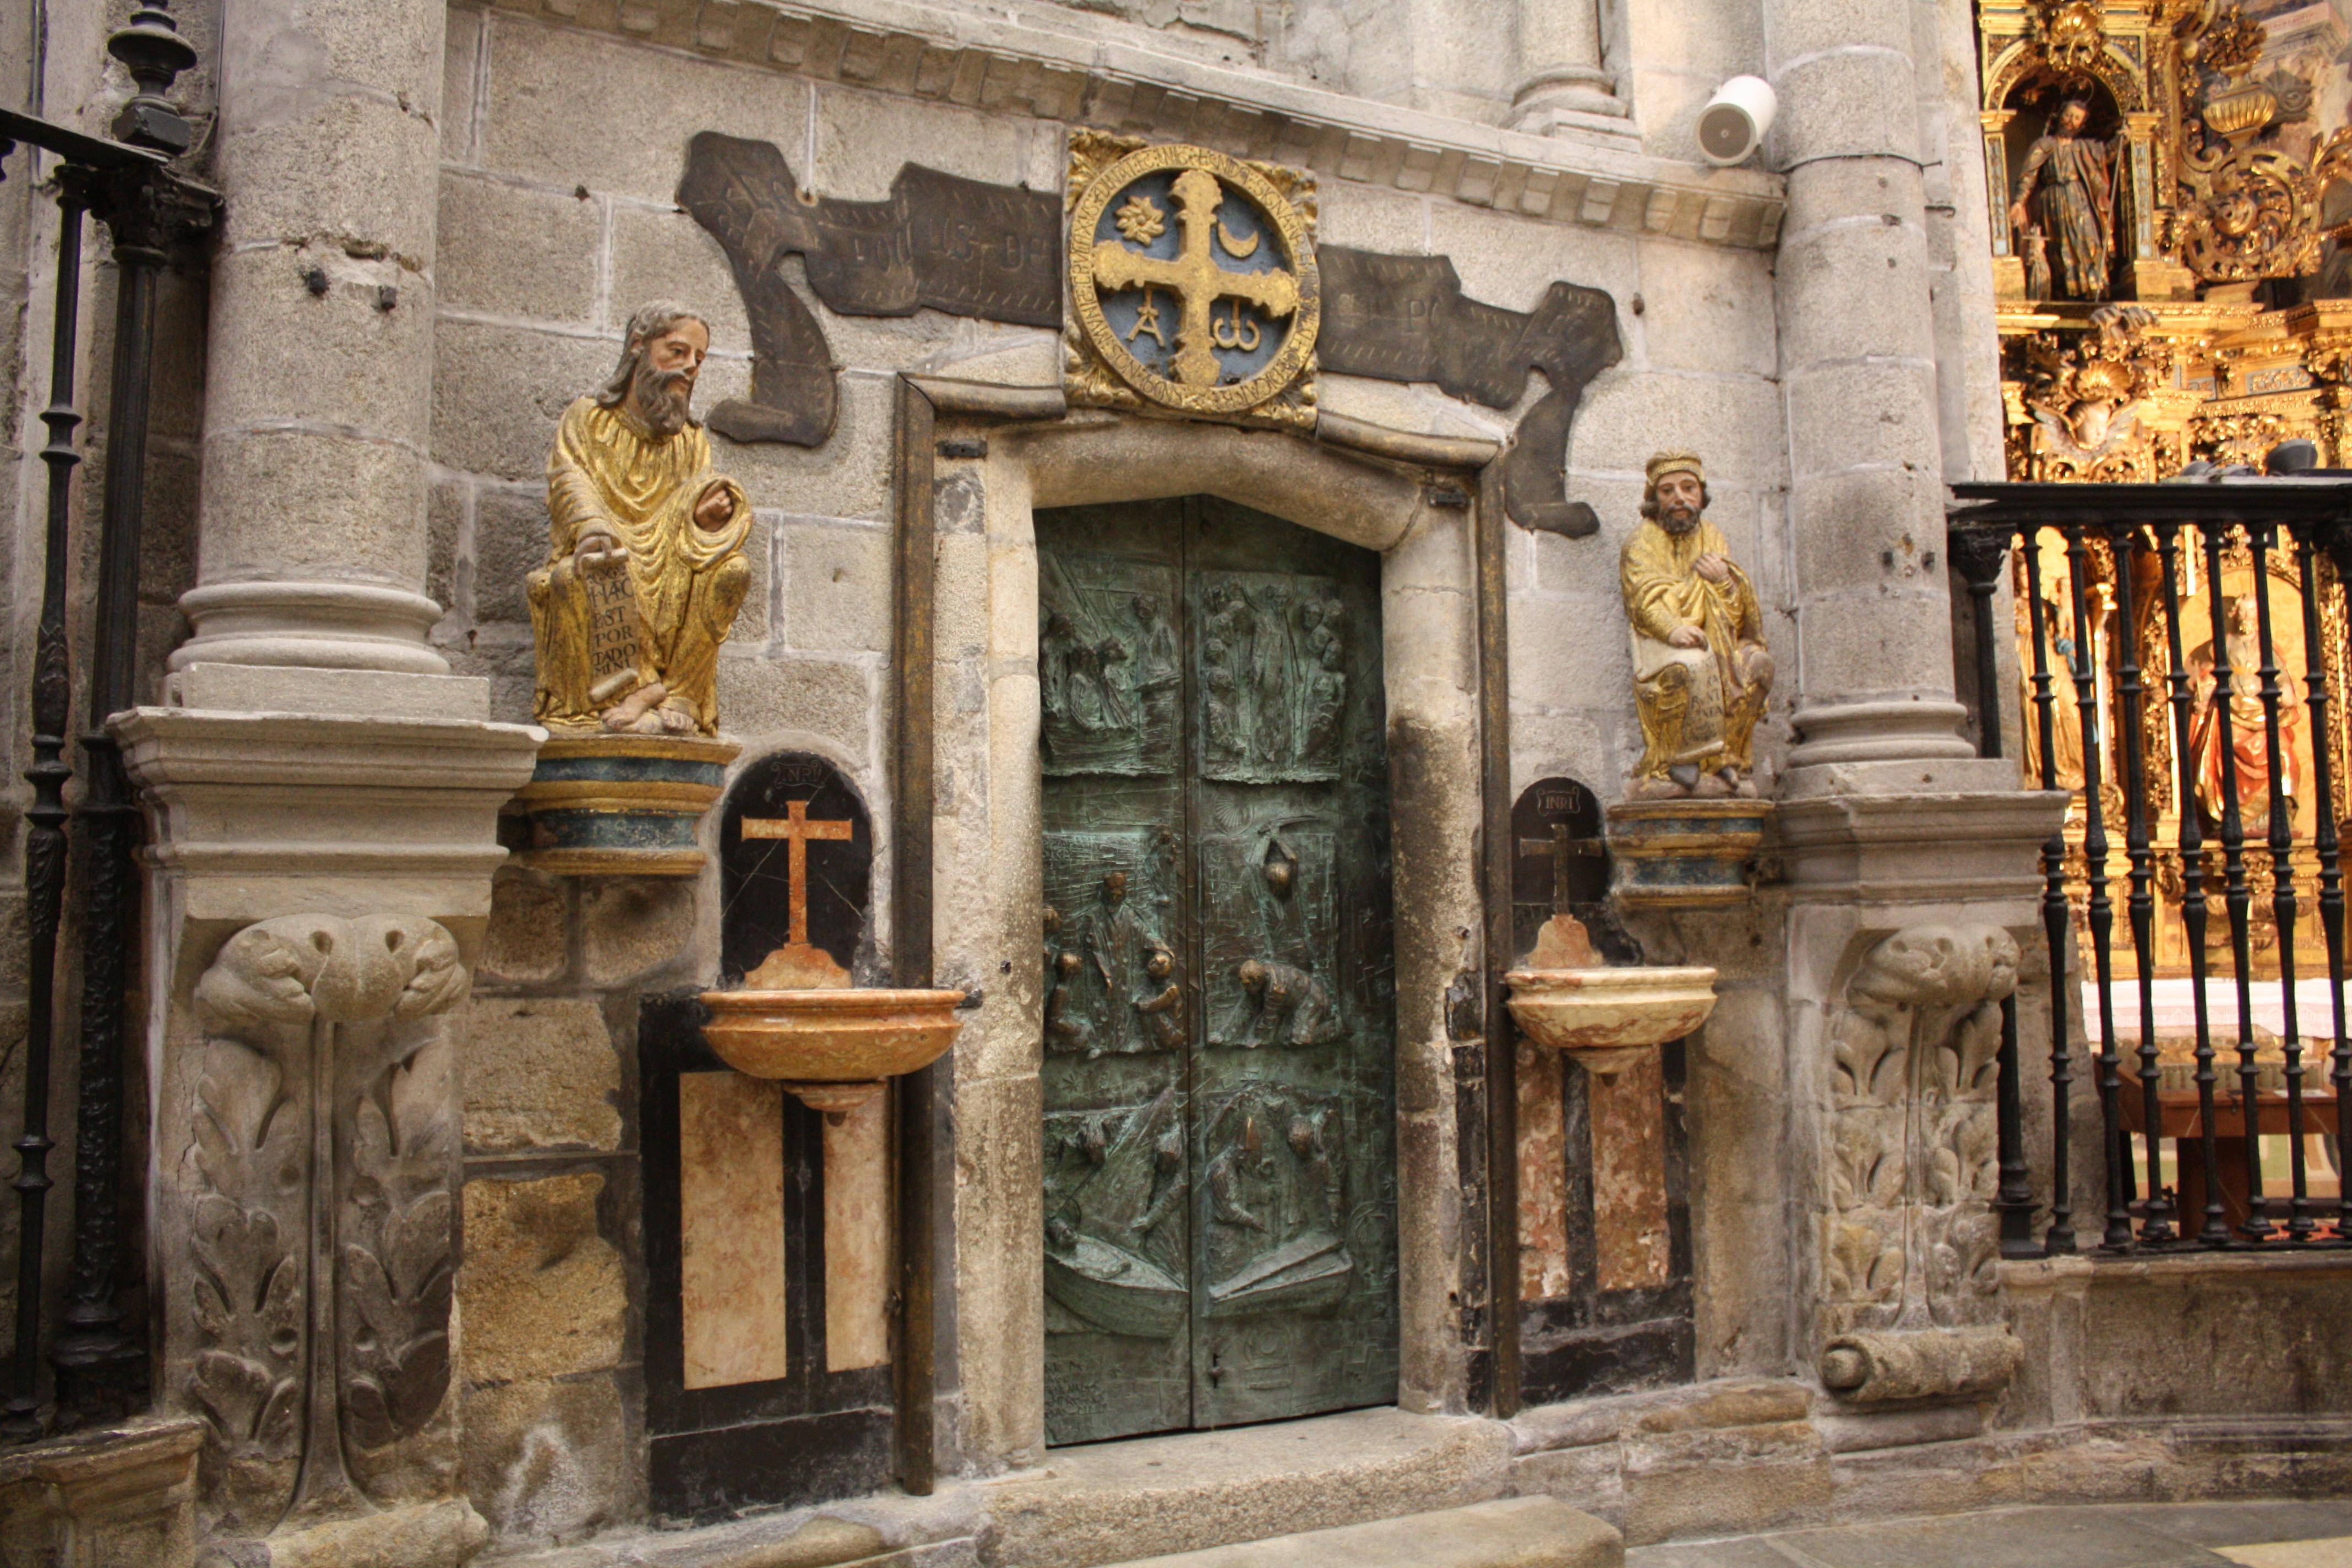 File:Santiago, Catedral Porta Santa 01-02.JPG - Wikimedia Commons